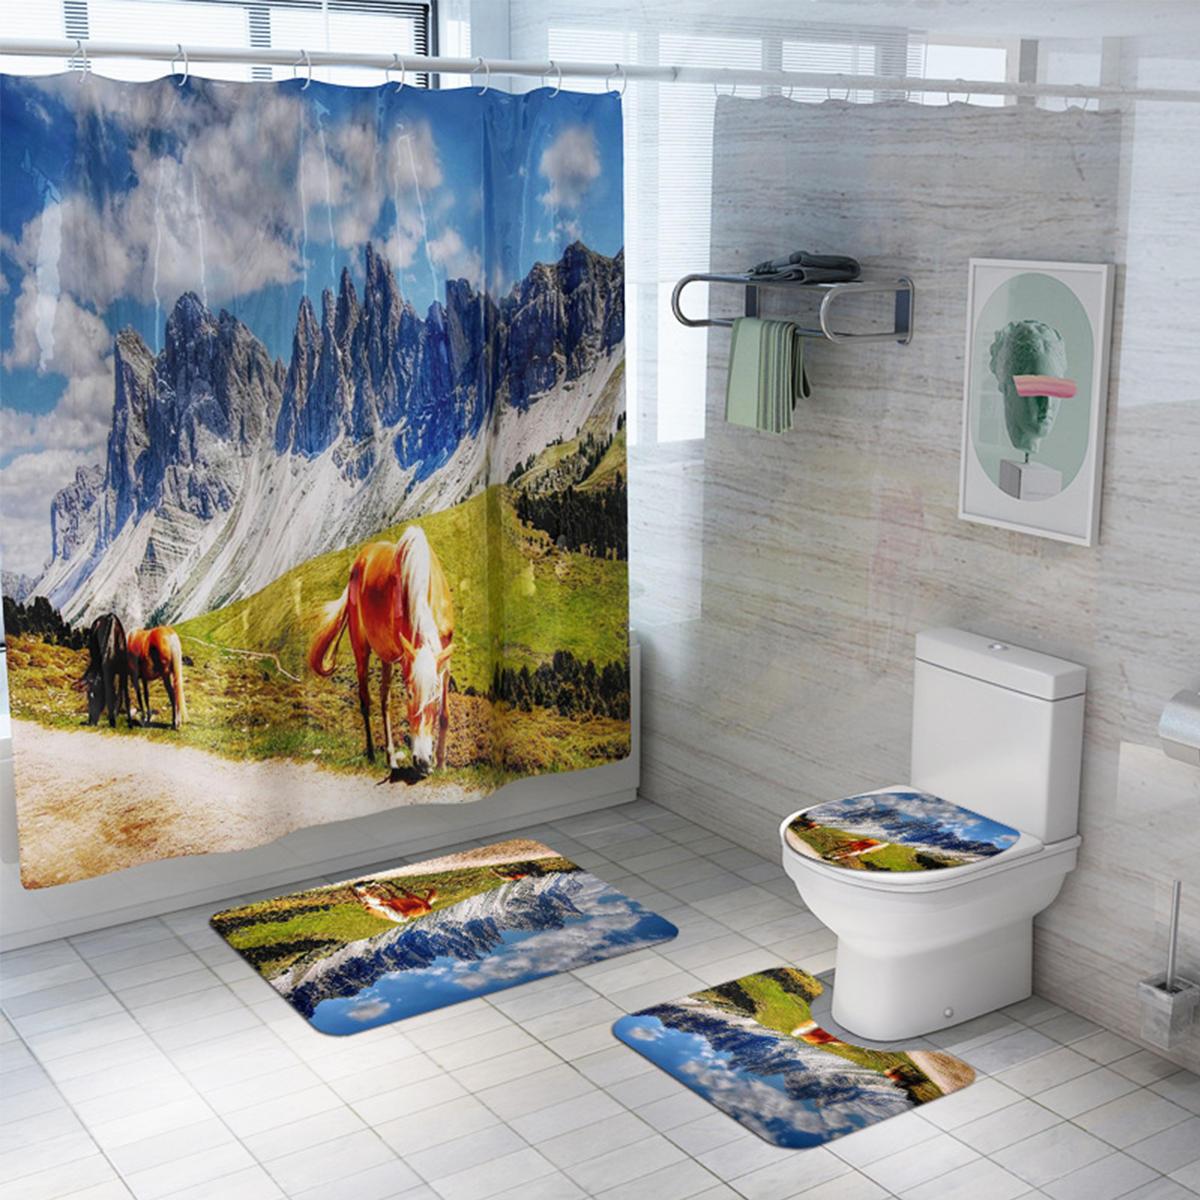 Oil Painting Horse Shower Curtain Bath Mat Toilet Cover Rug Bathroom Decor Set